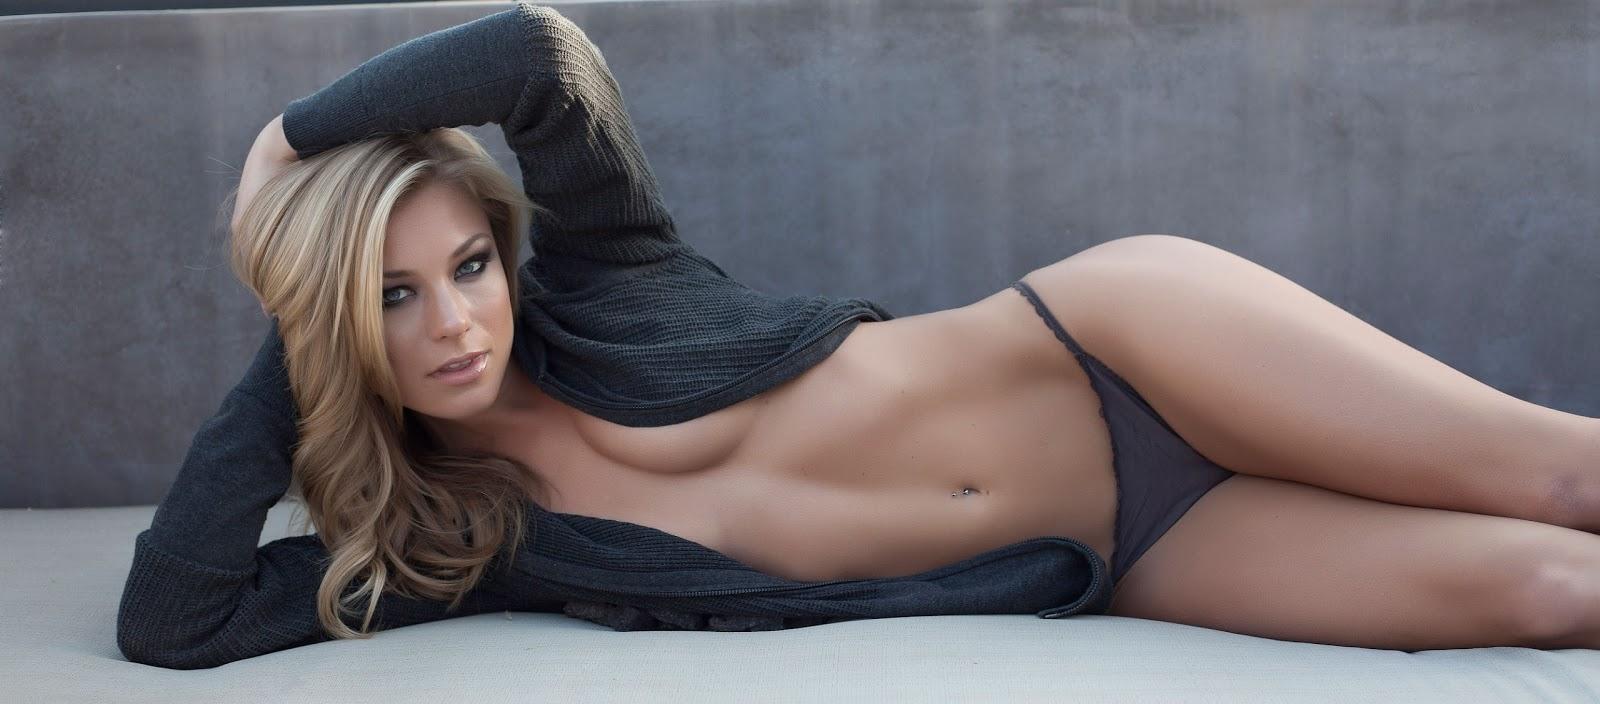 Jo ashton micro bikini